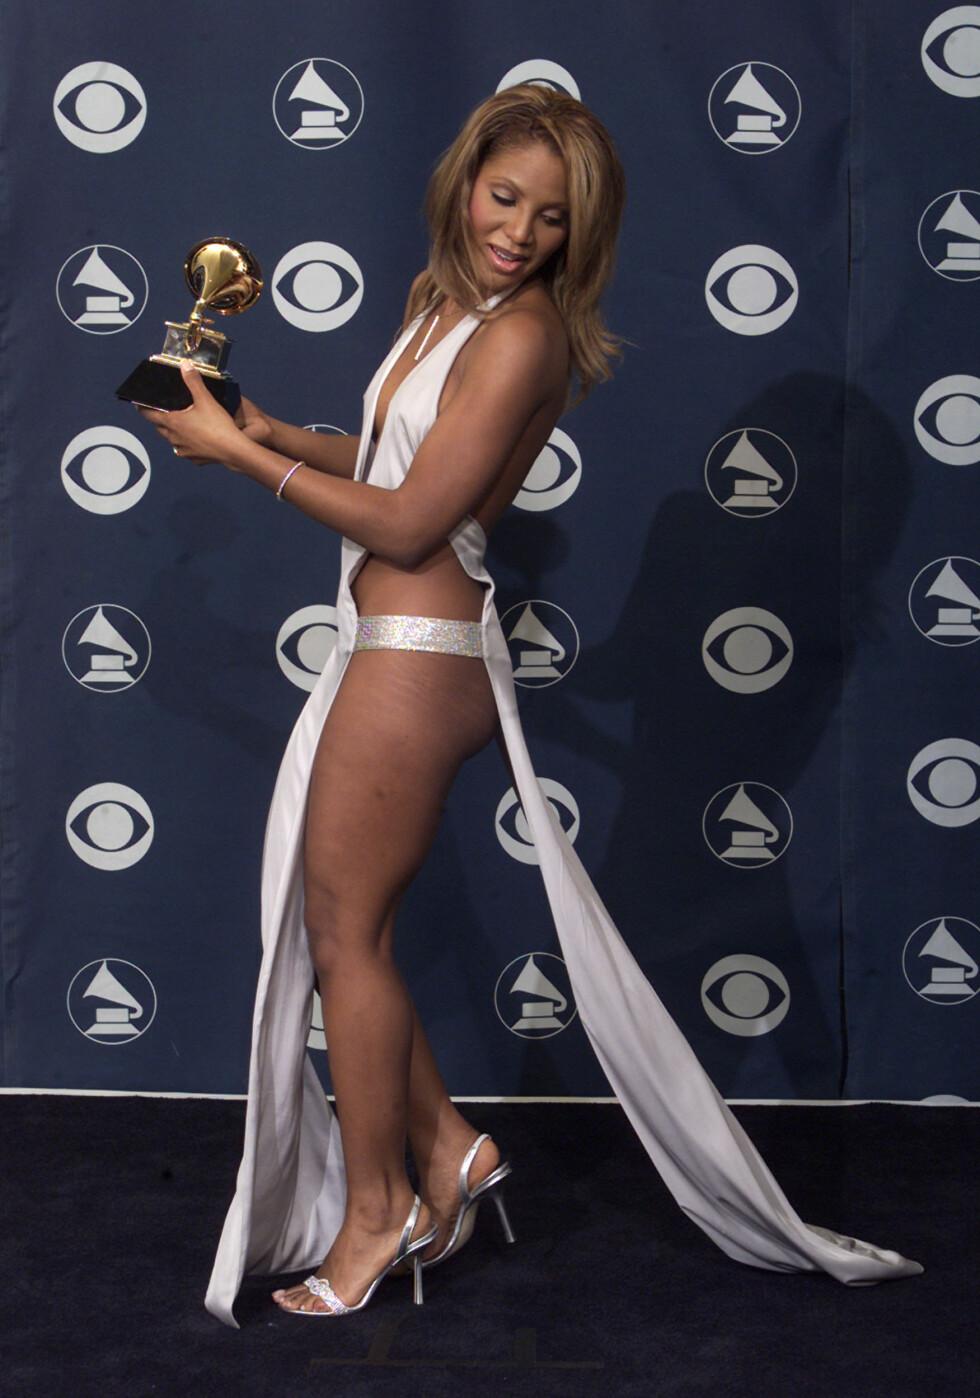 ANNO 2001: Artist Toni Braxton fotografert under Grammy-utdelingen i 2001. Foto: NTB Scanpix